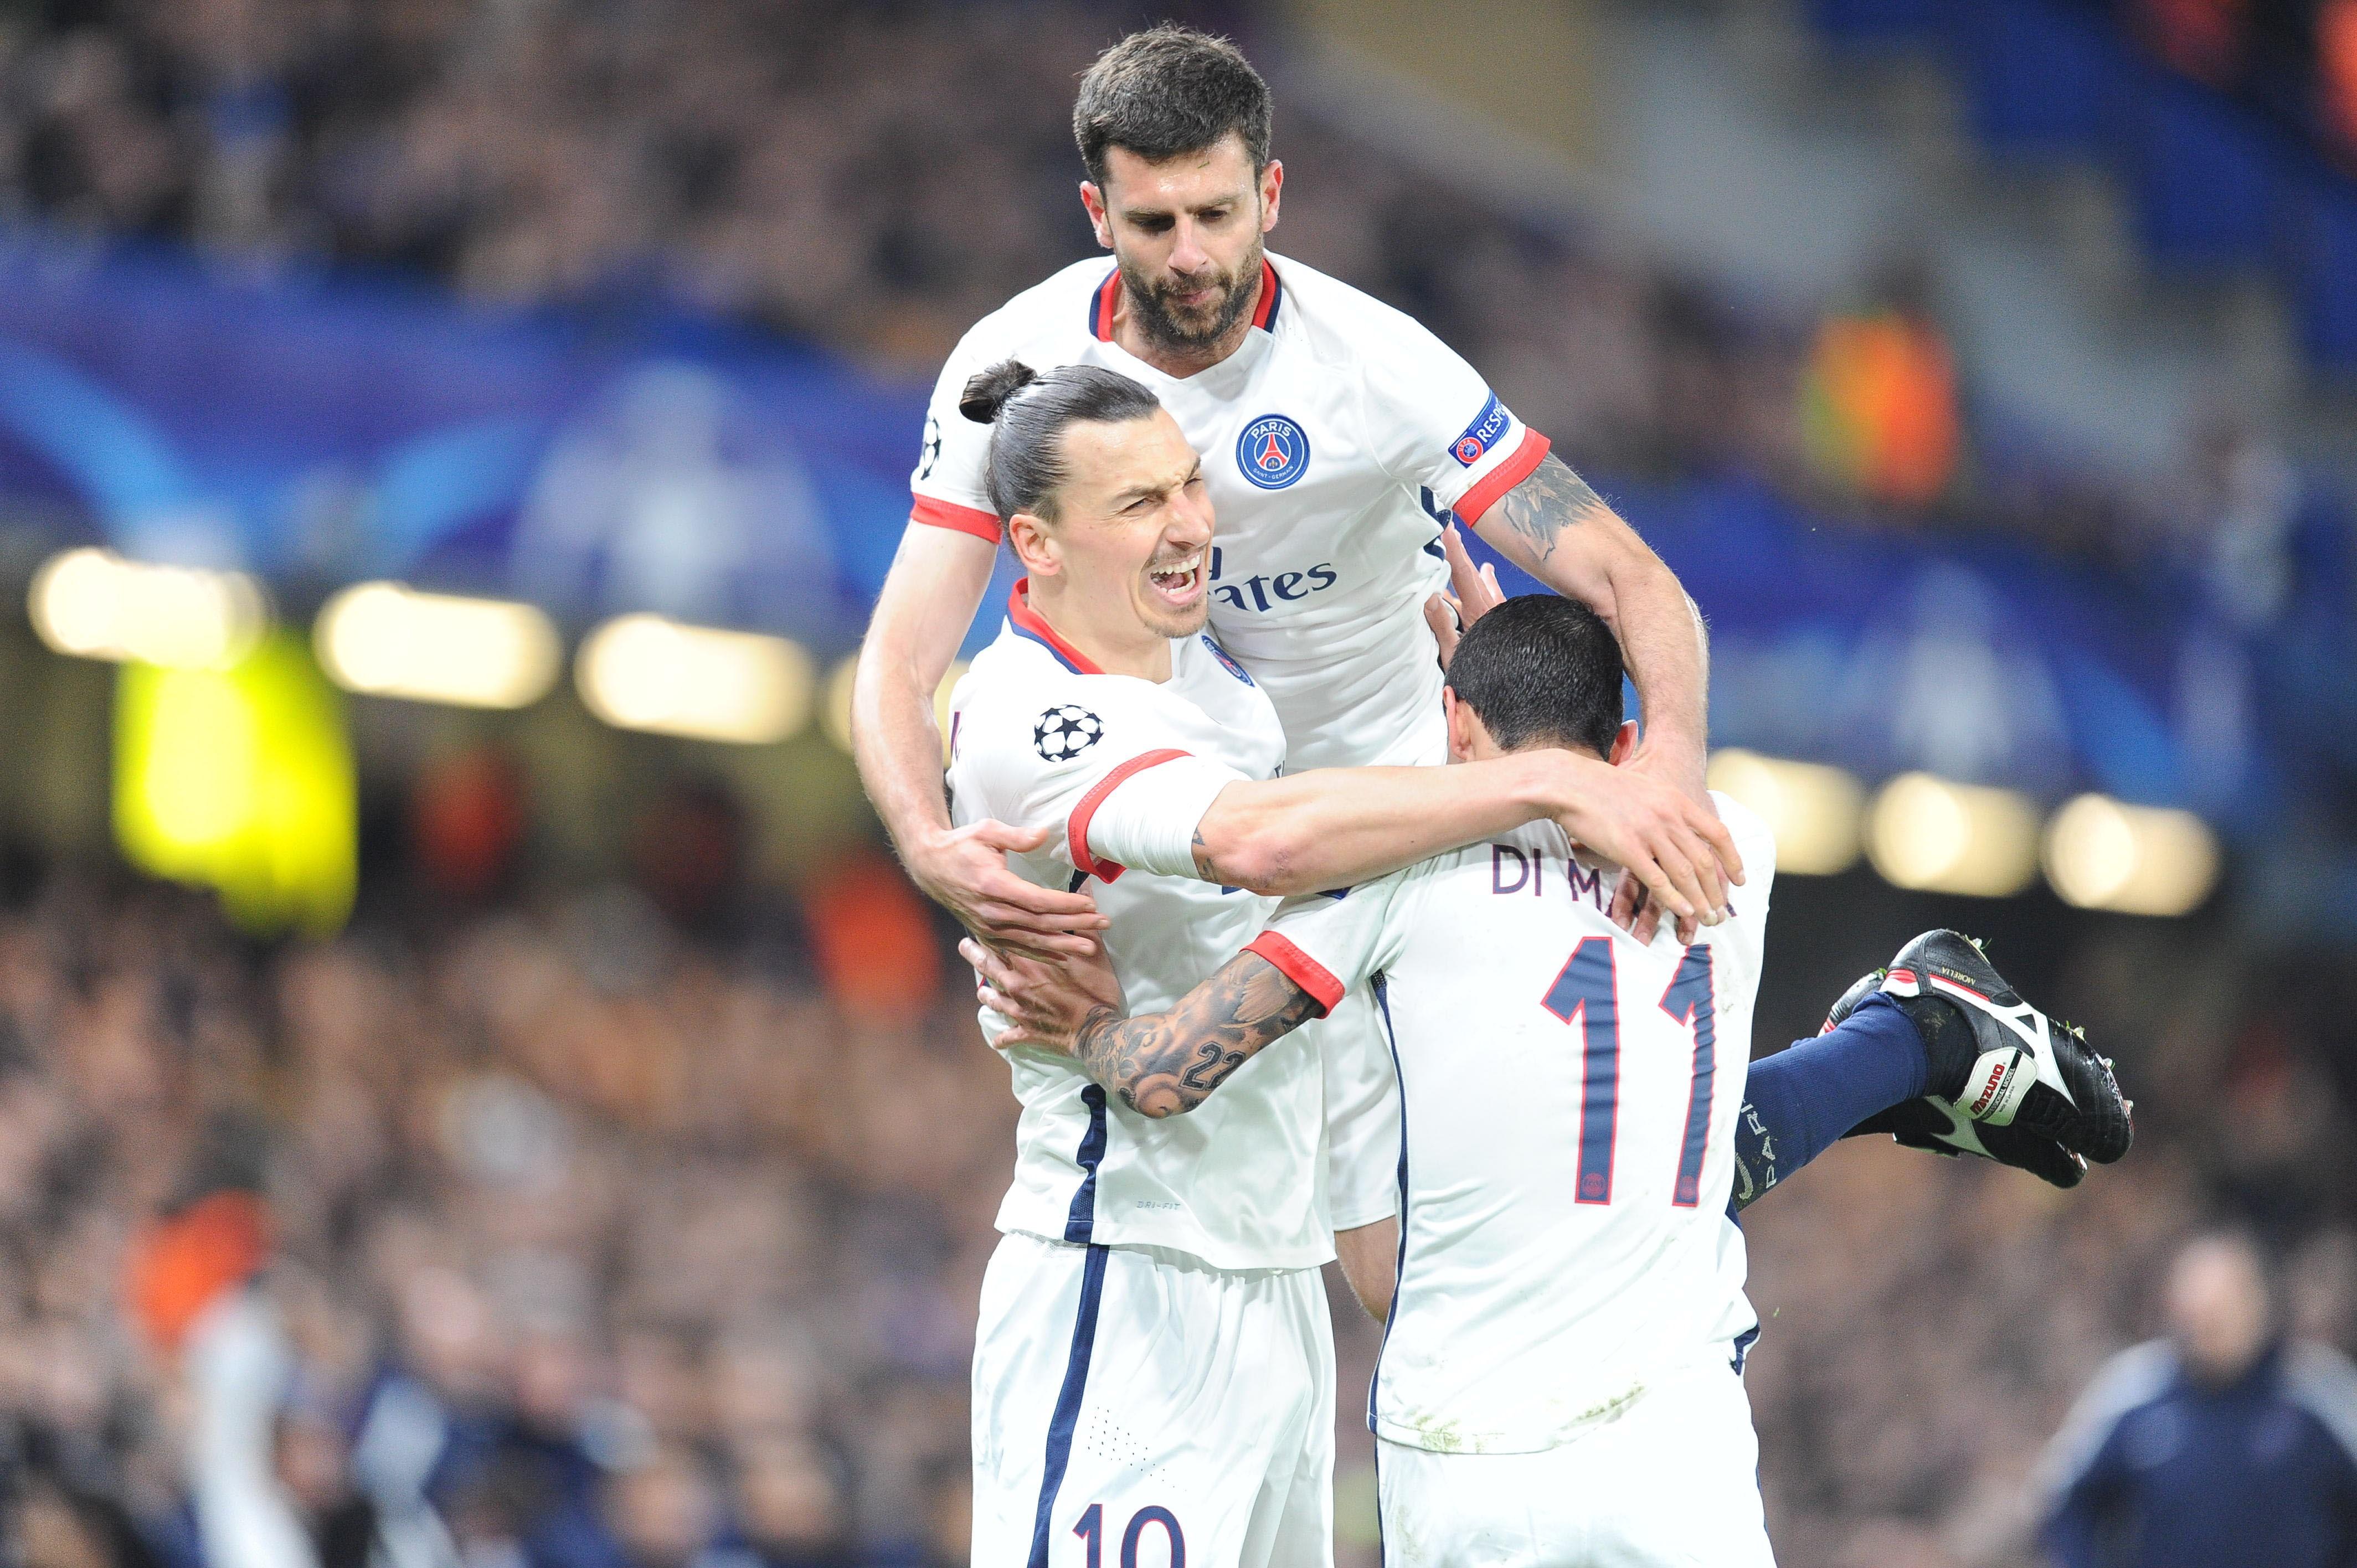 Thiago Motta, Zlatan Ibrahimovic et Angel Di Maria (PSG) sur la pelouse de Chelsea